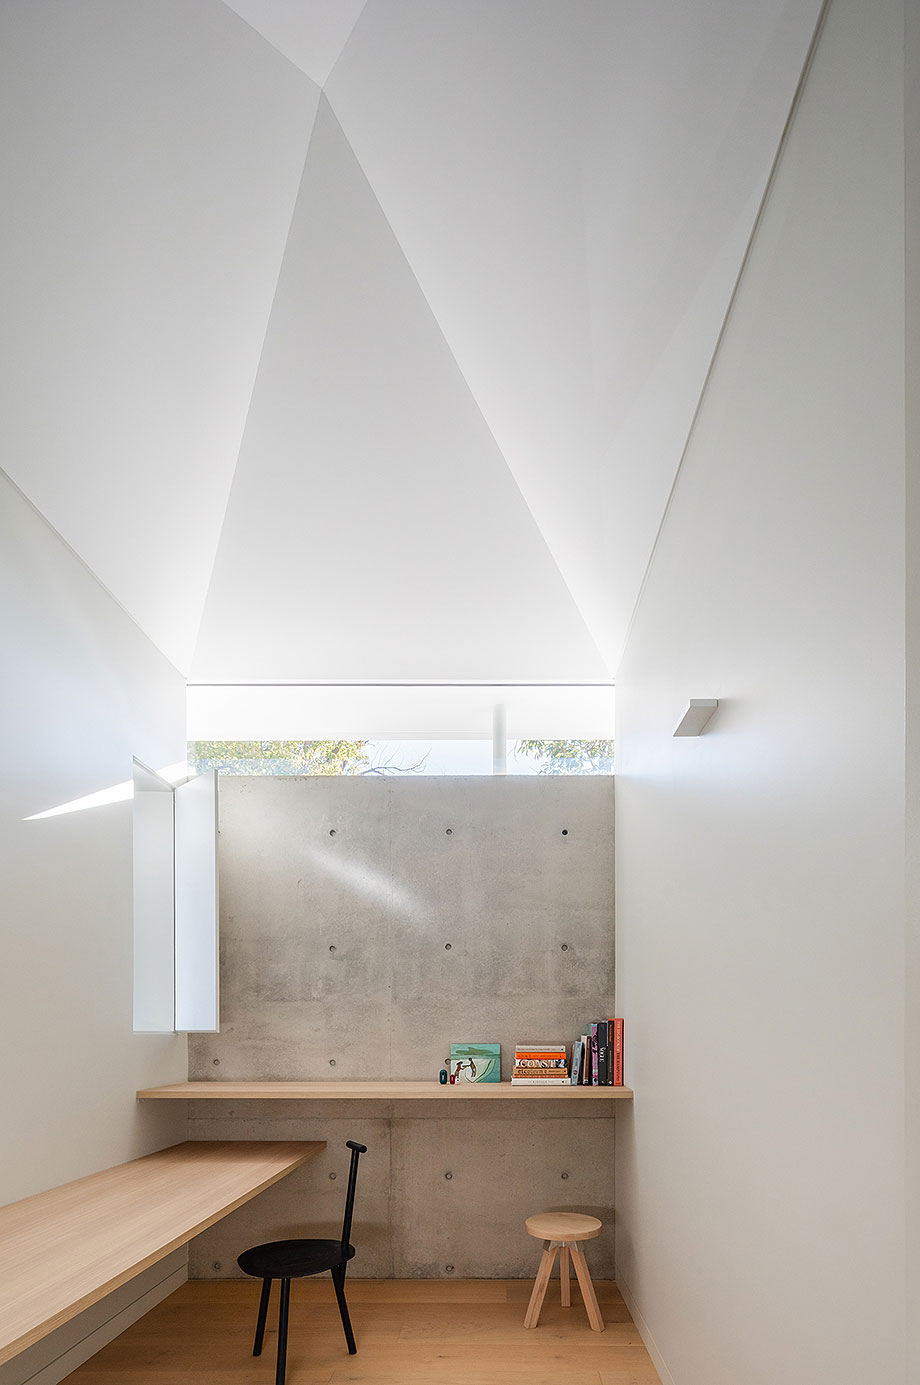 ampliacion de una casa en dulwich hill por benn + penna architects (9) - foto tom ferguson + katherine lu